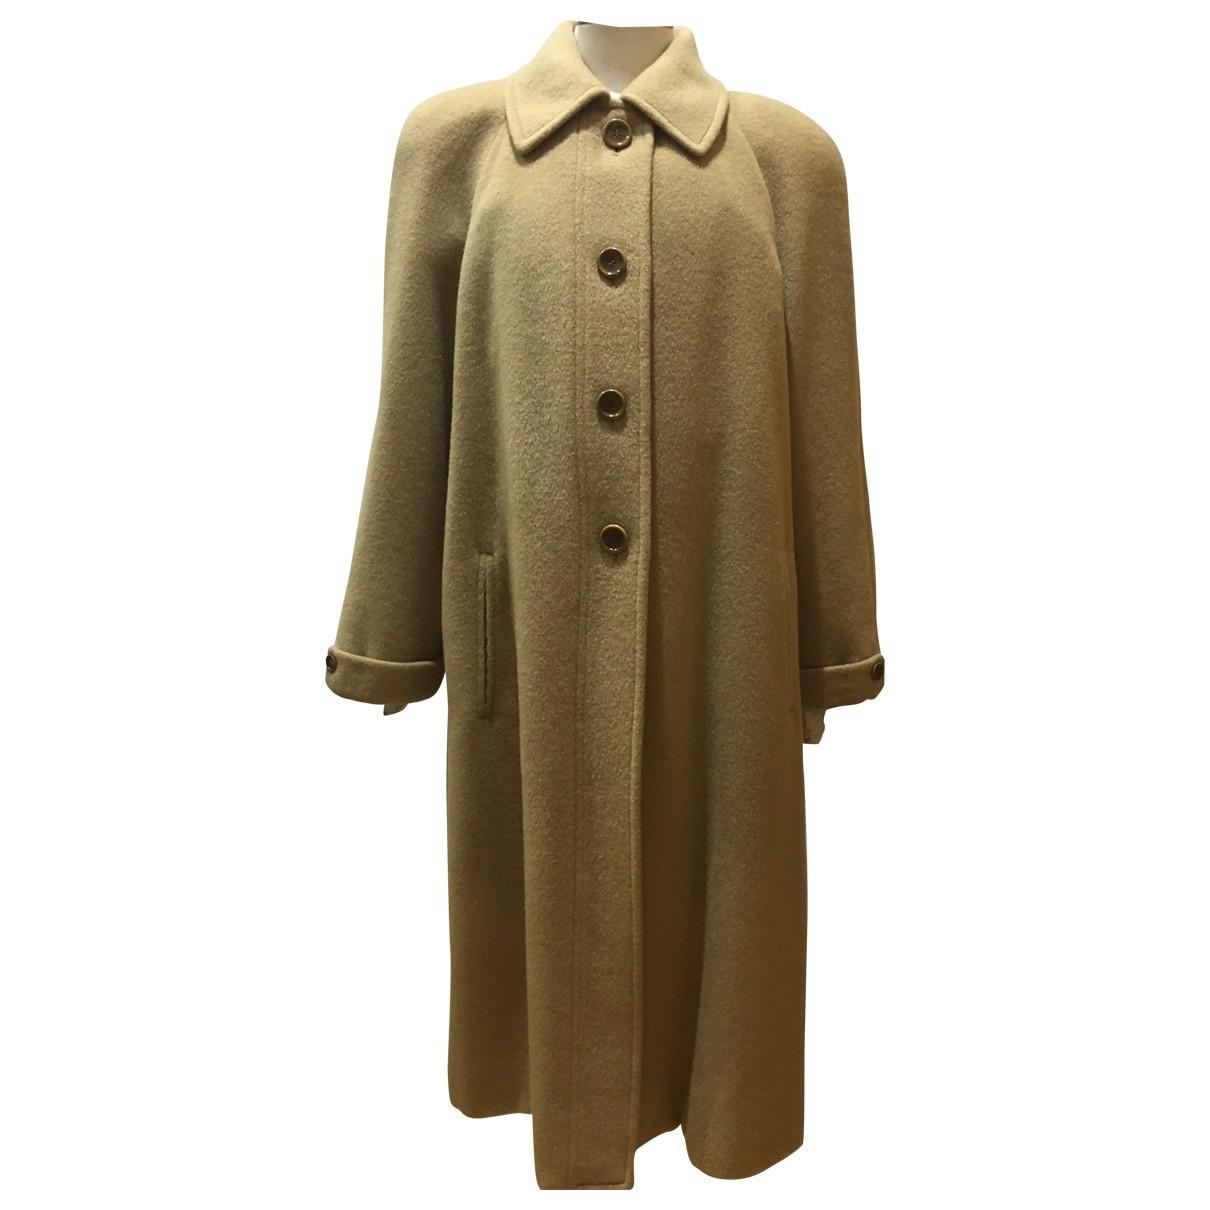 Loewe \N Camel Wool coat for Women L International